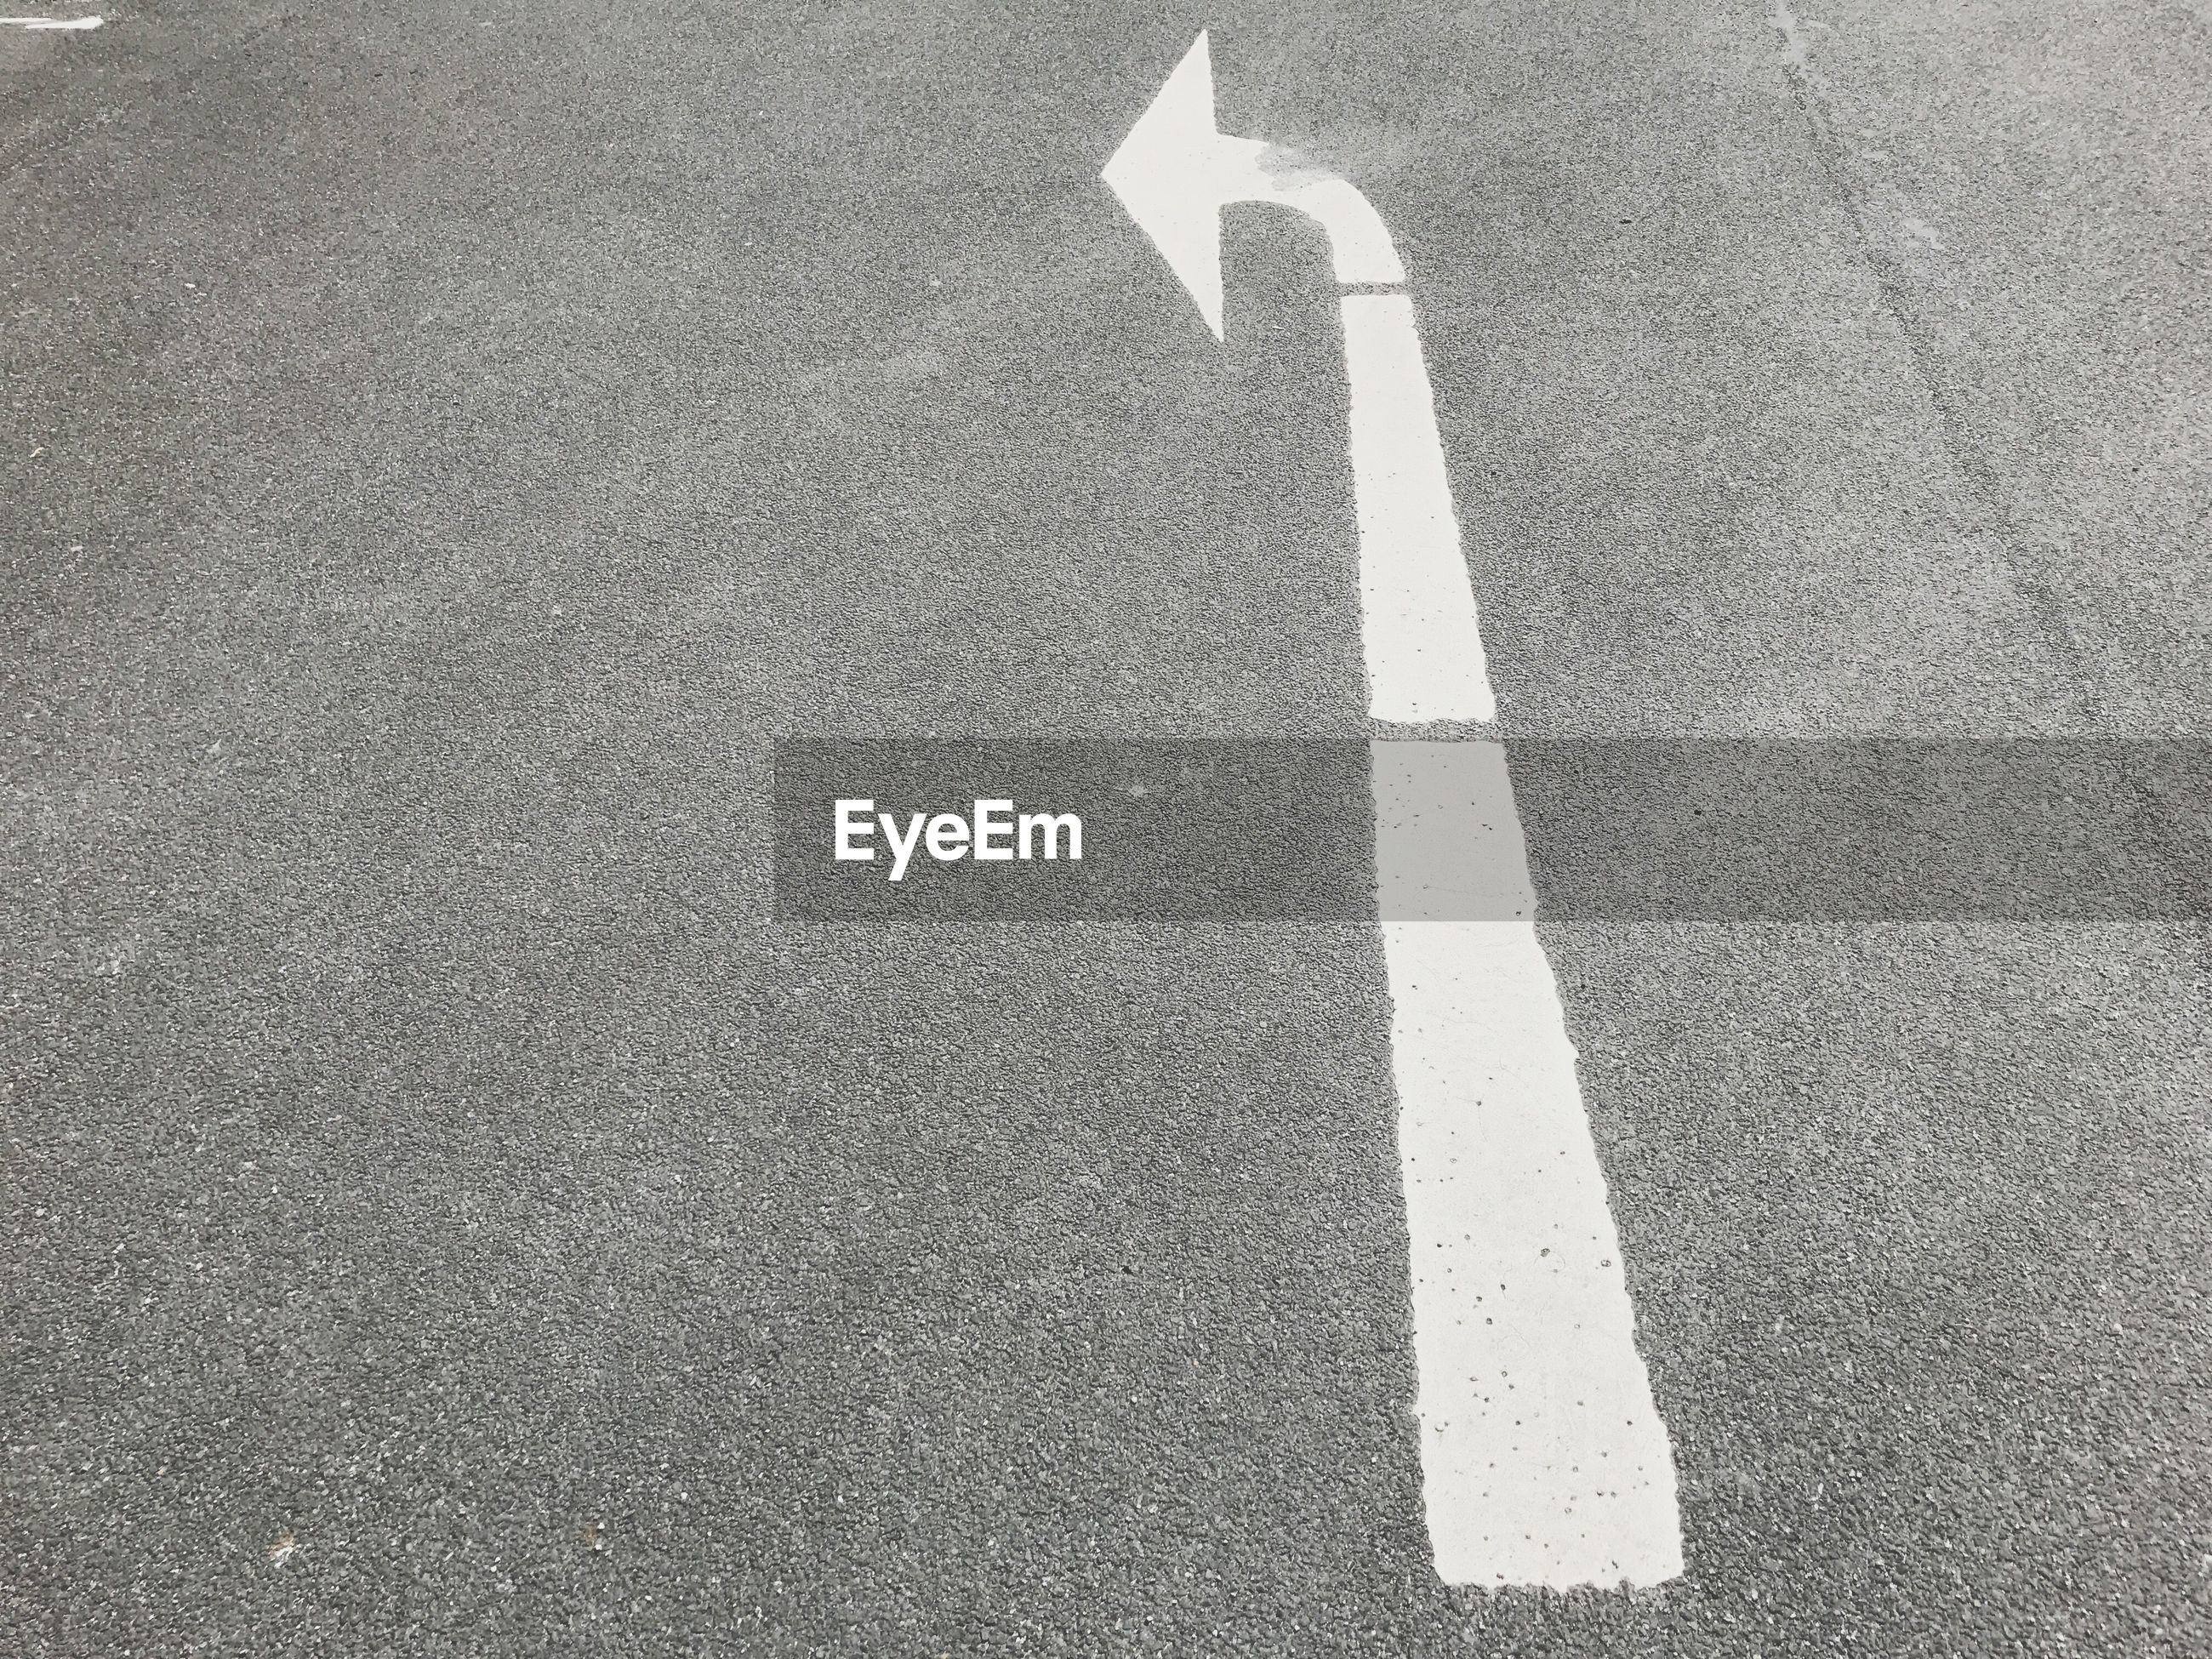 High angle view of arrow symbol on asphalt road